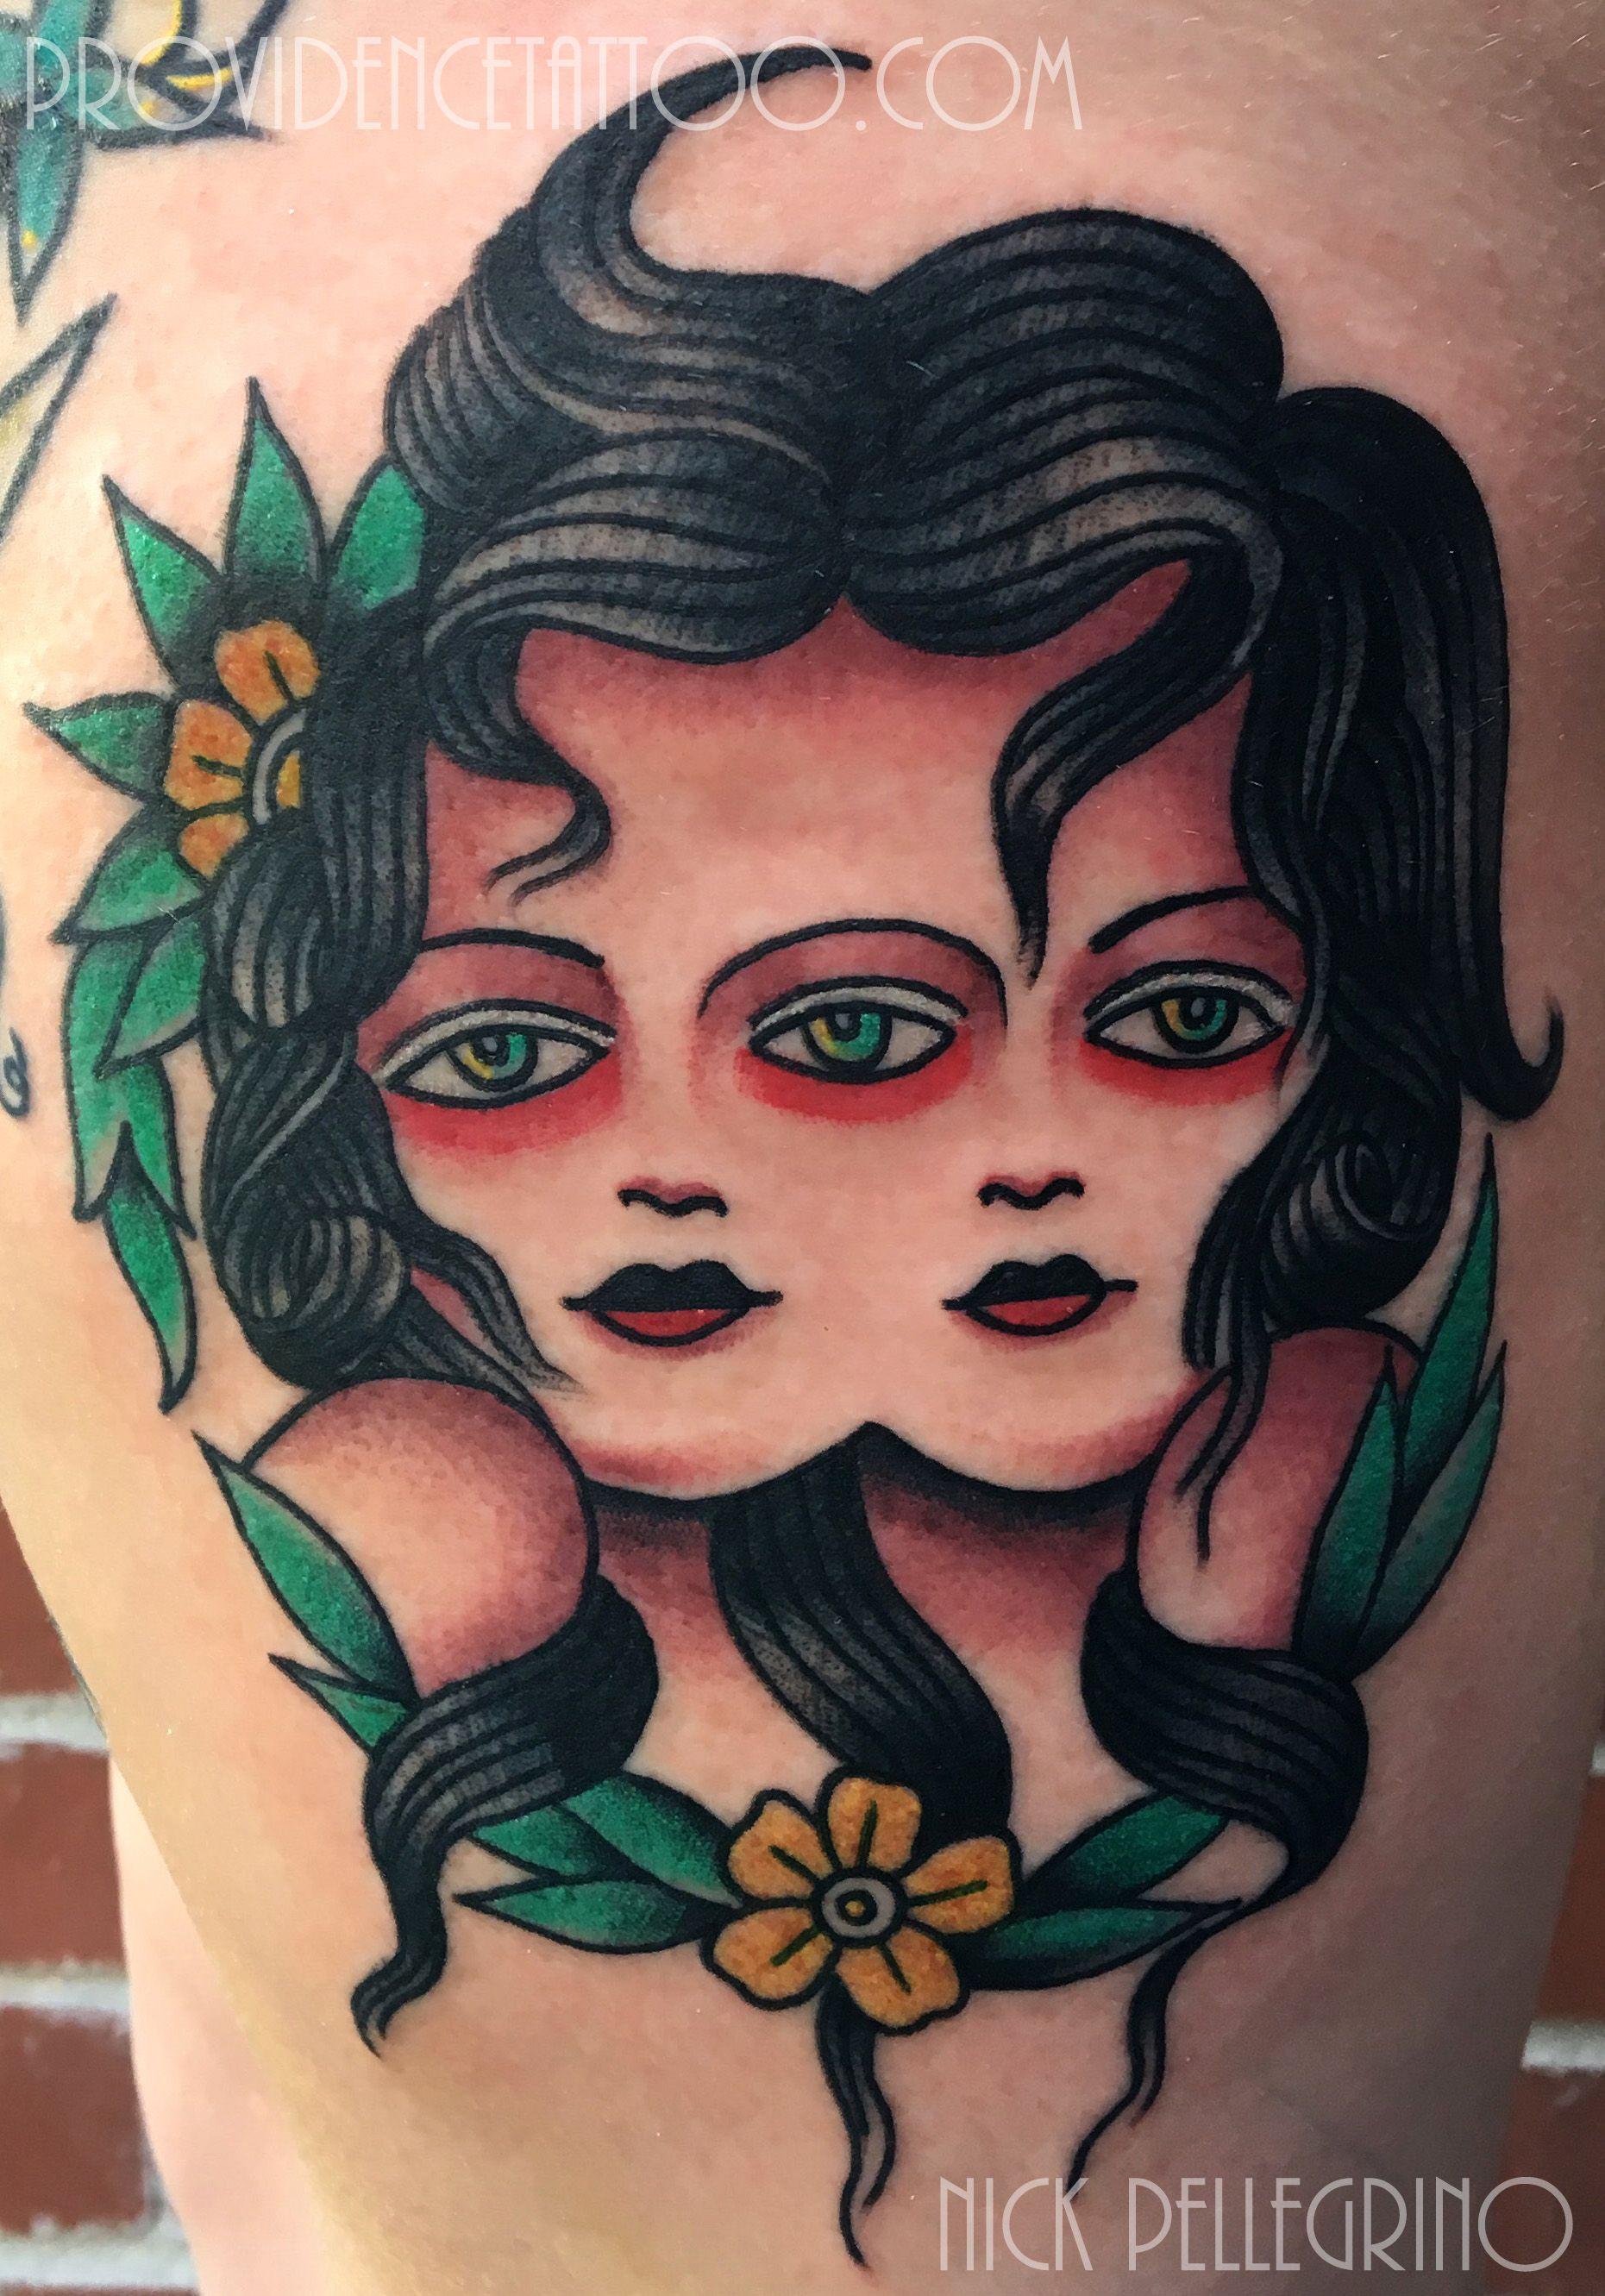 tattoo by Nick Pellegrino at Providence Tattoo #nickpelle #nickpellegrino…